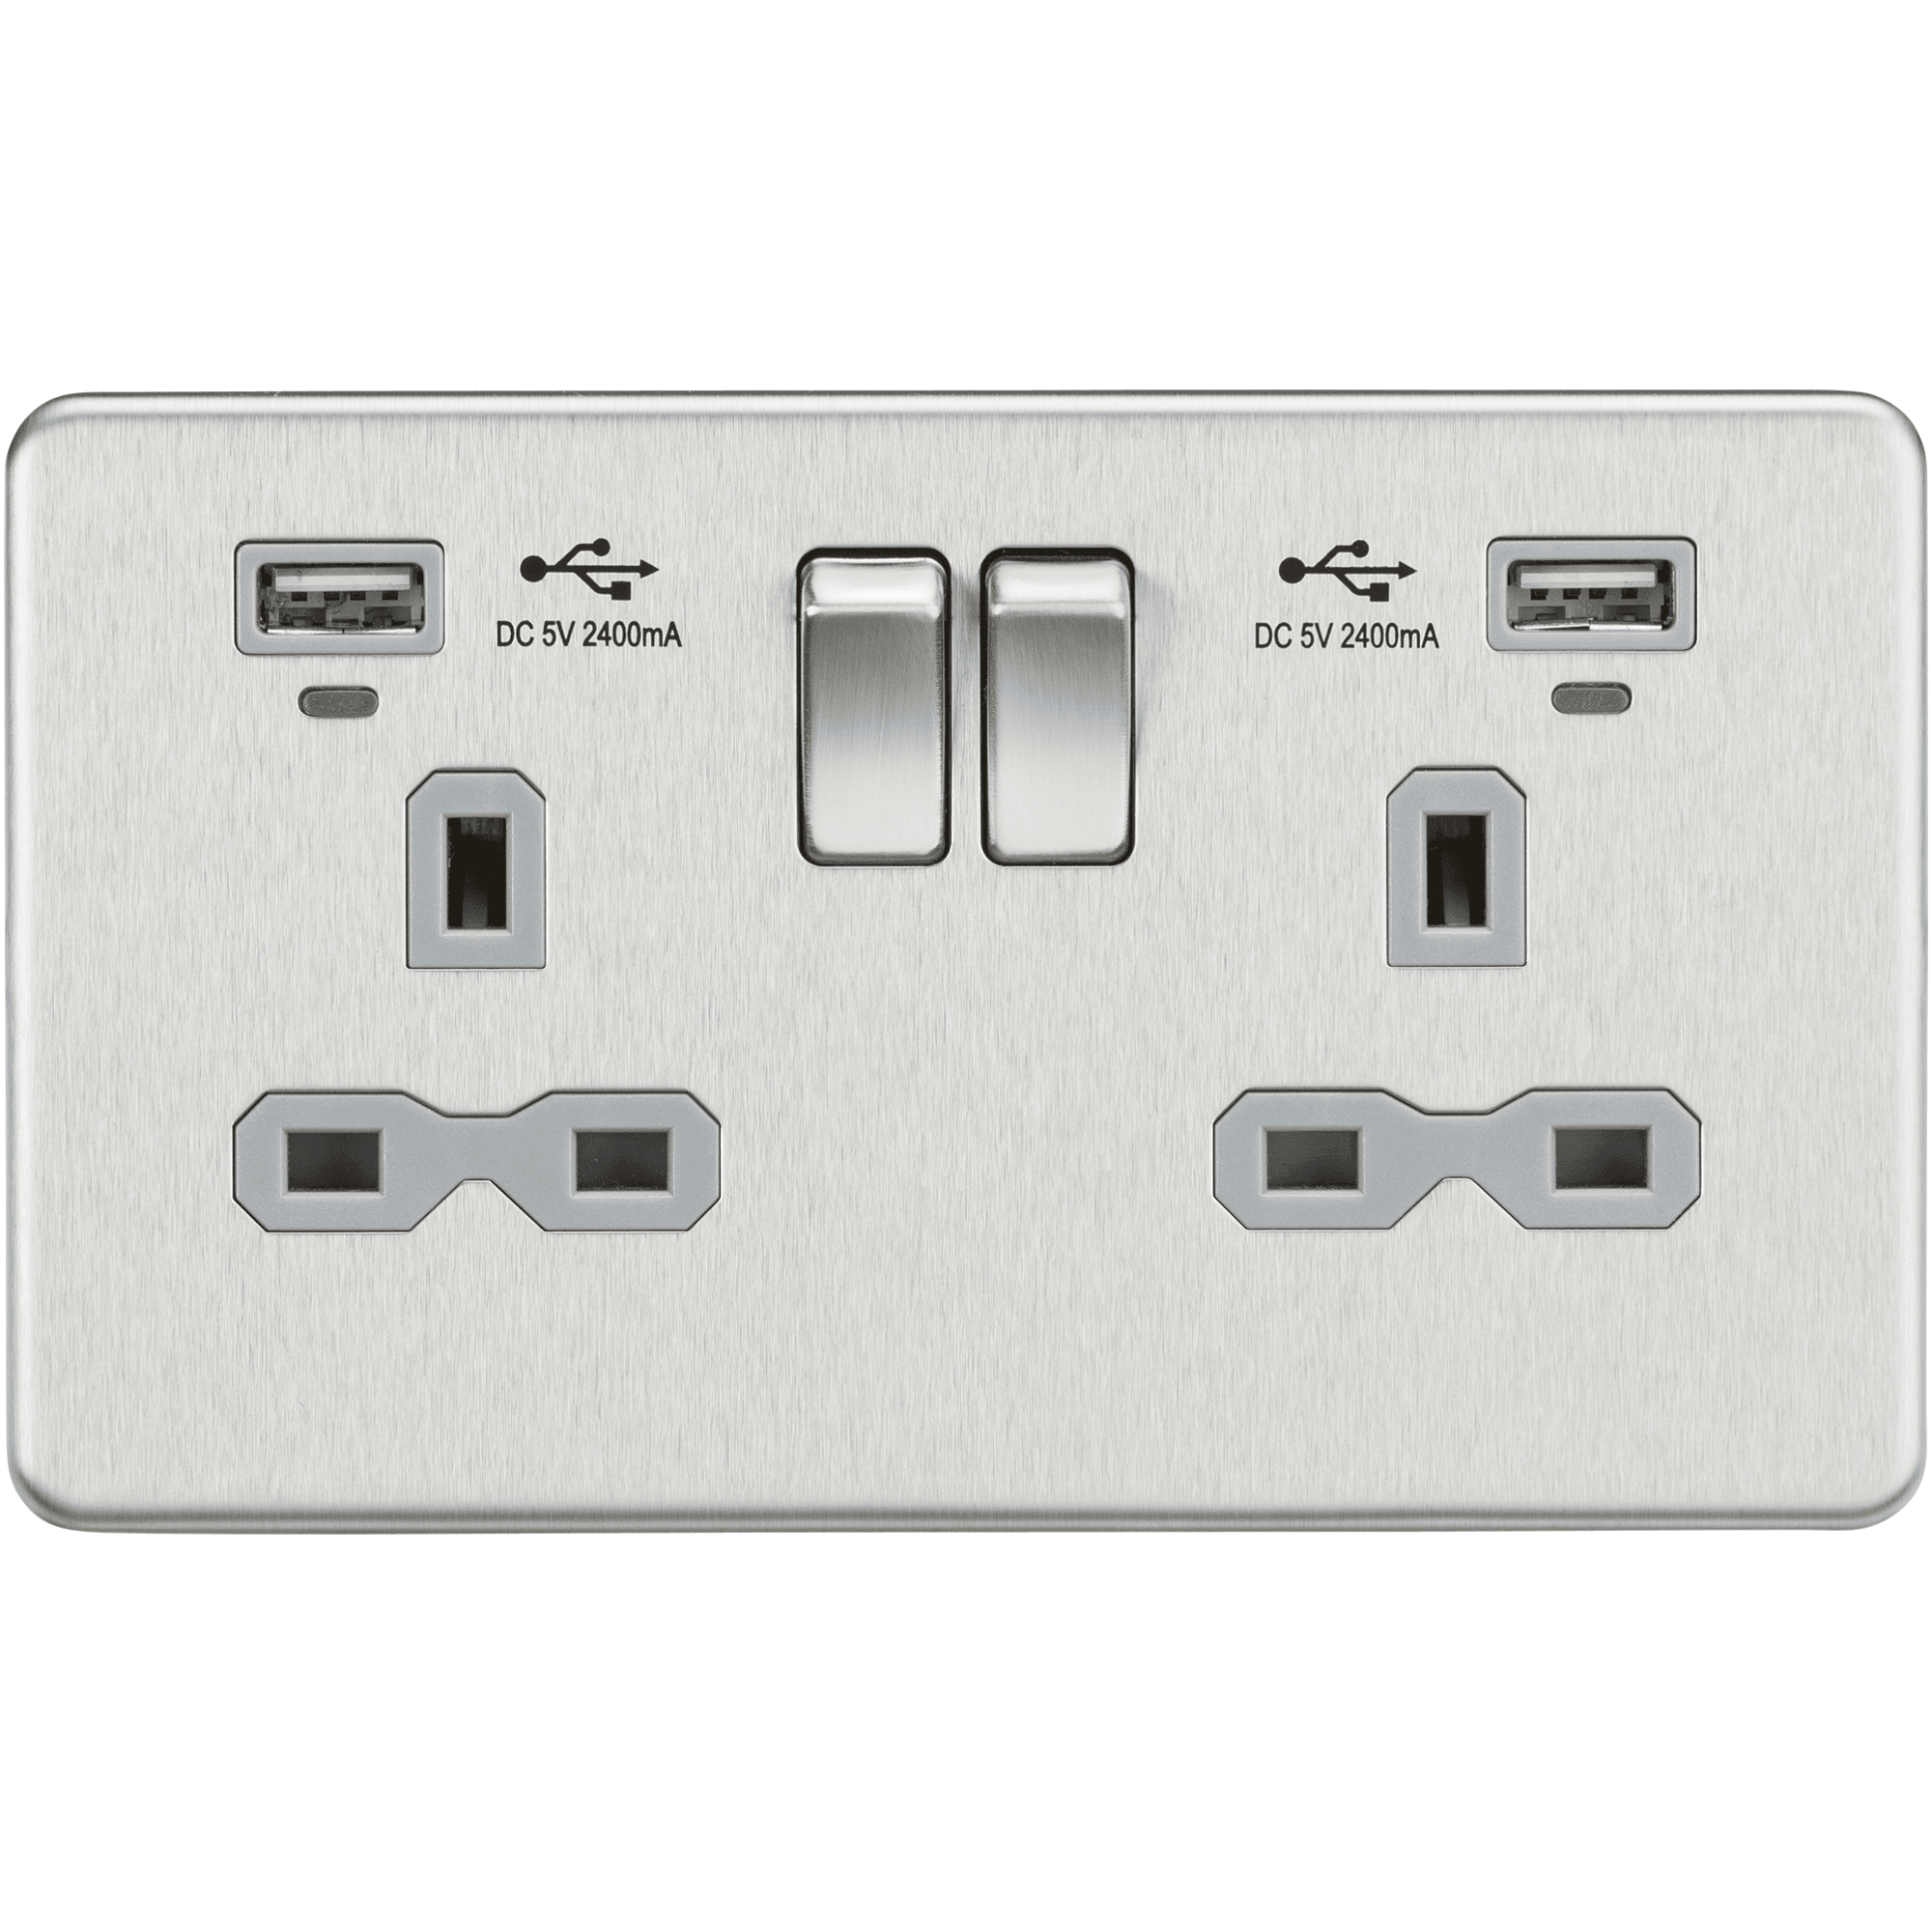 Knightsbridge Screwless 13 A 2 G DP Switched Socket-Blanc Mat